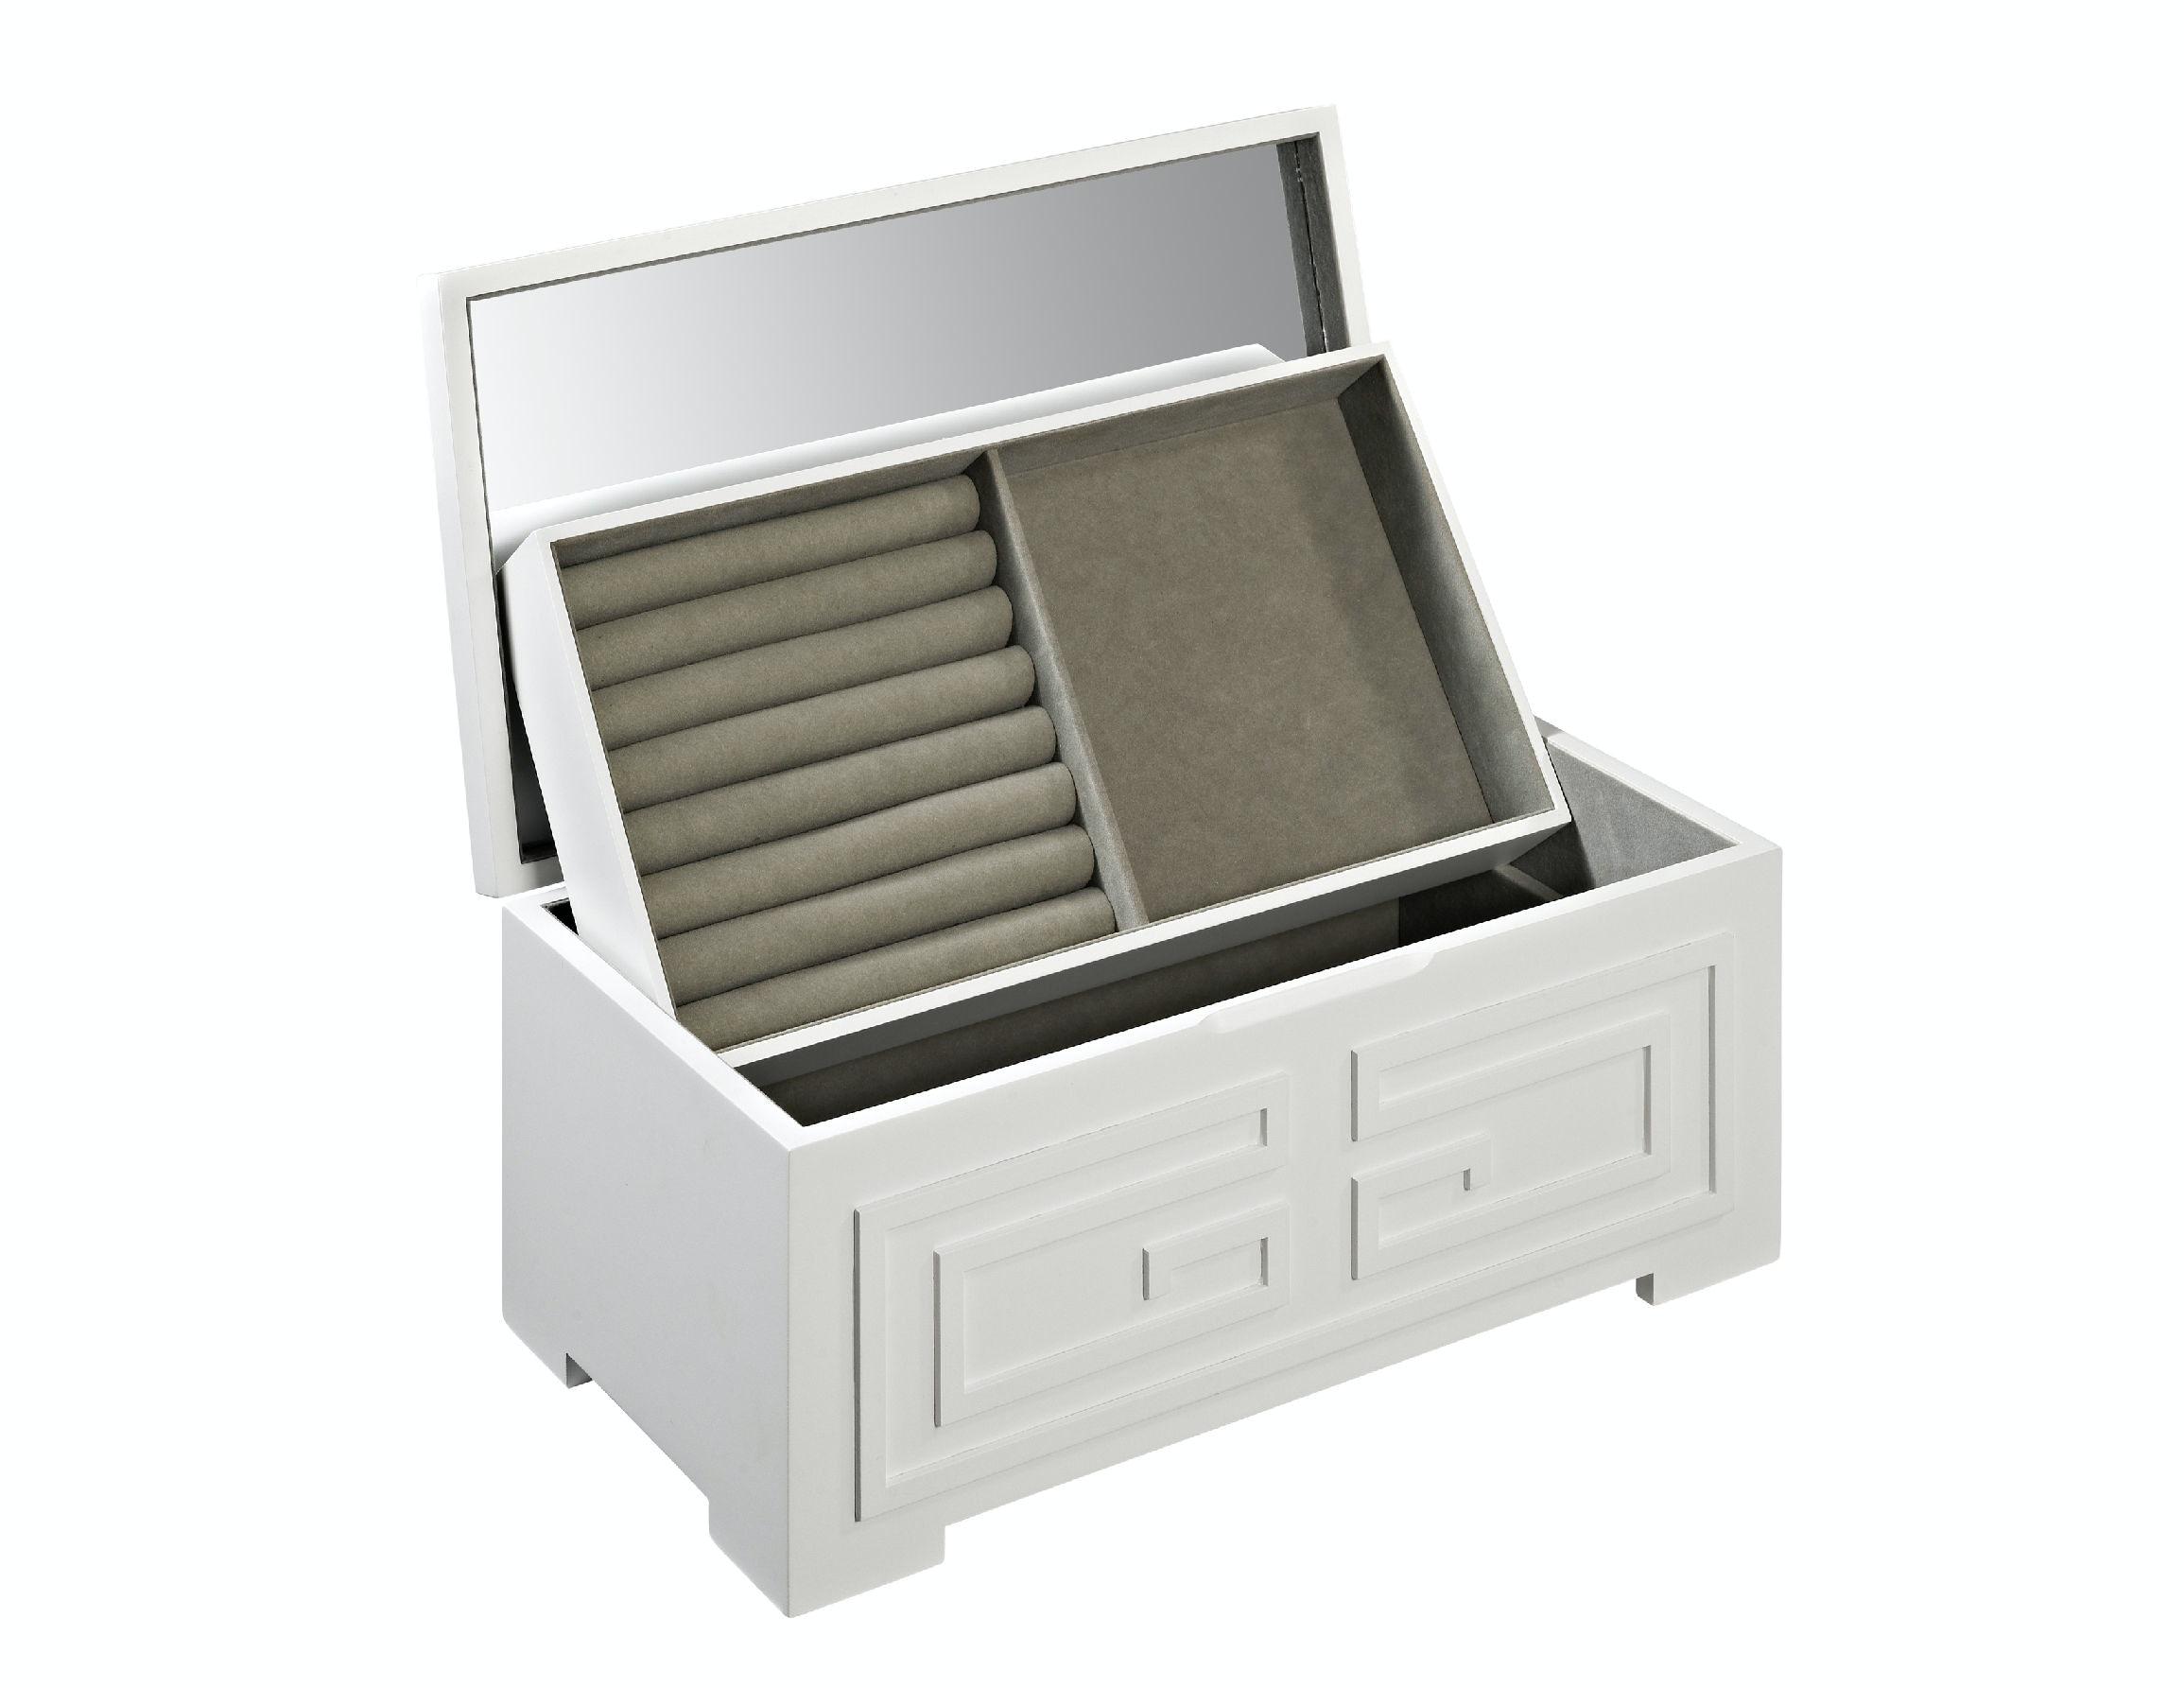 Powell Furniture Enna White Jewelry Box 126 J110